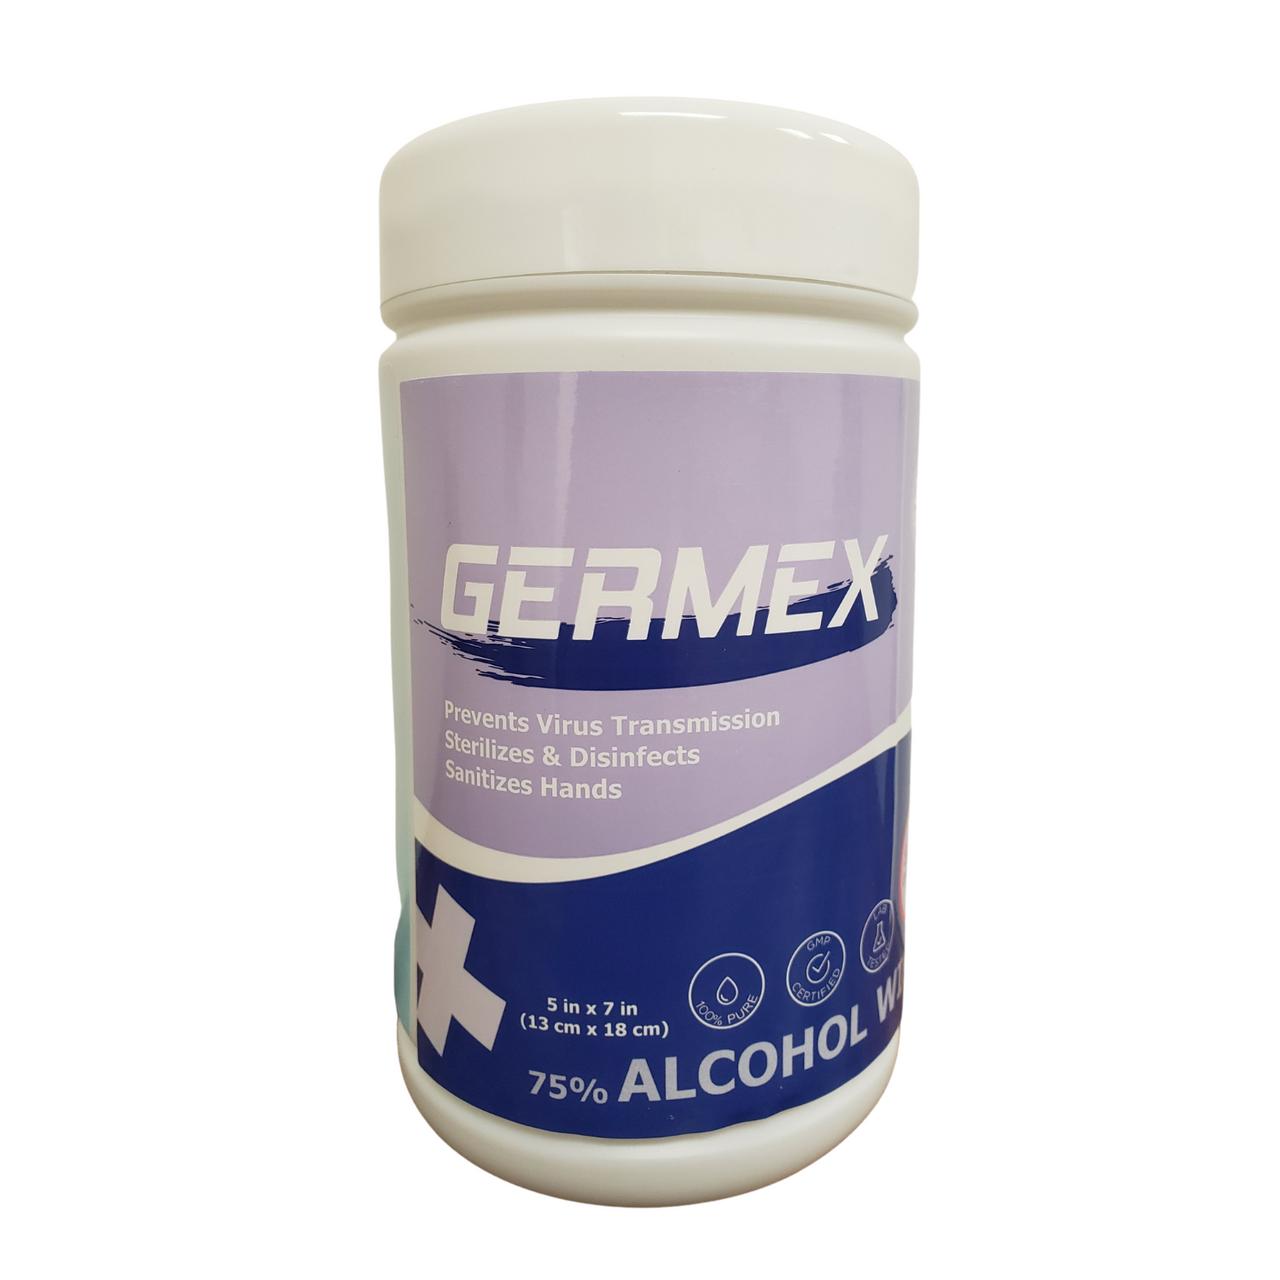 GERMEX Alcohol Wipes (Multi-Purpose, Anti-Bacterial)